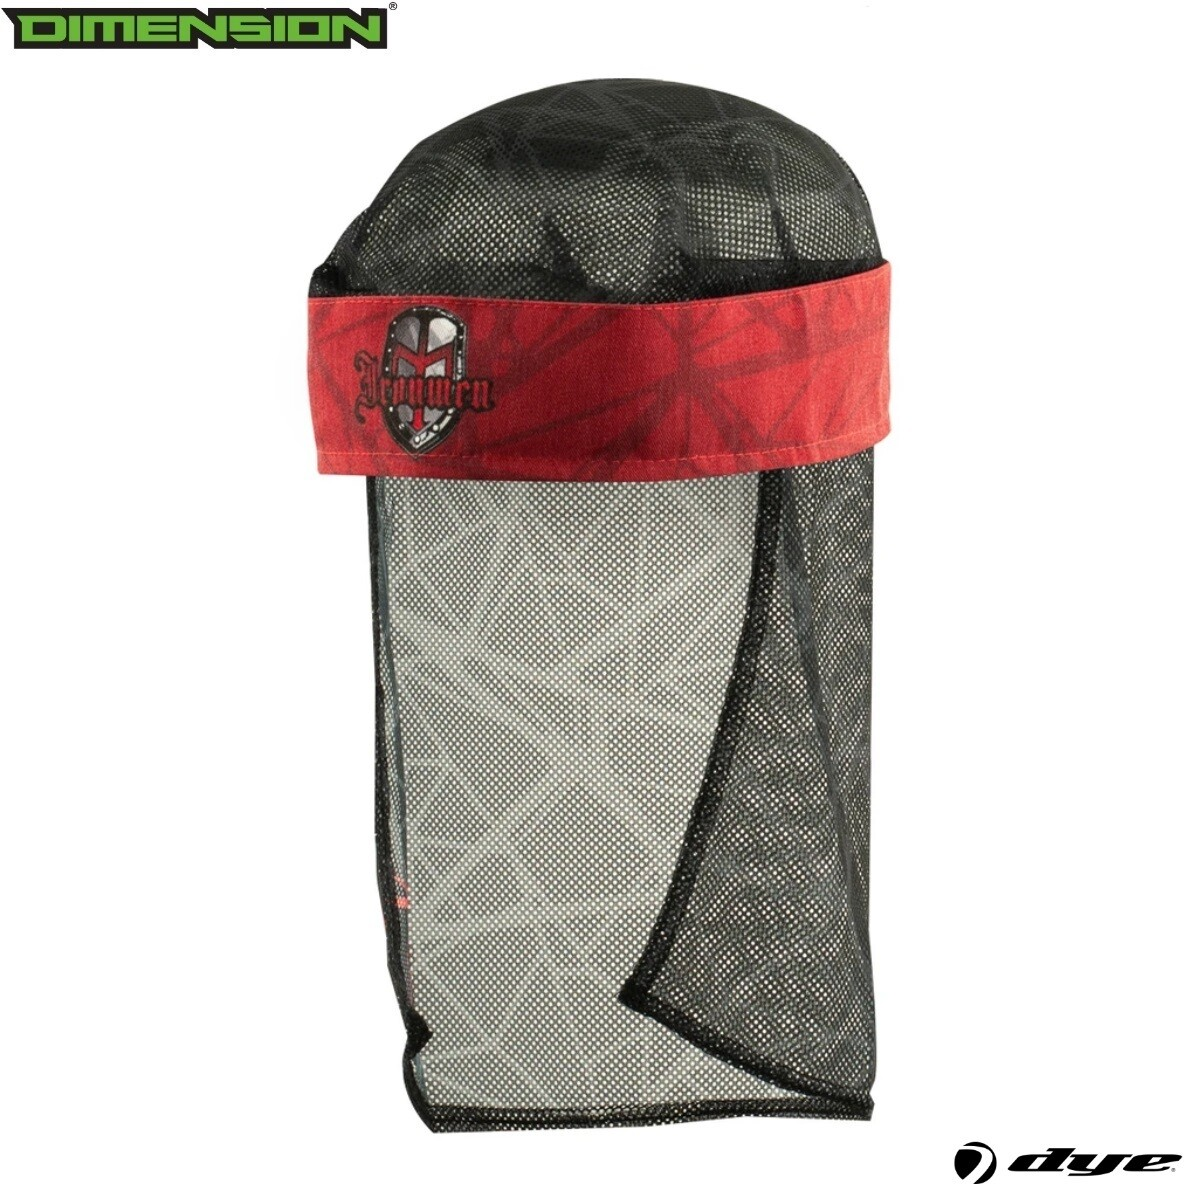 Dye Head Wrap - Ironmen UL - Red/Black